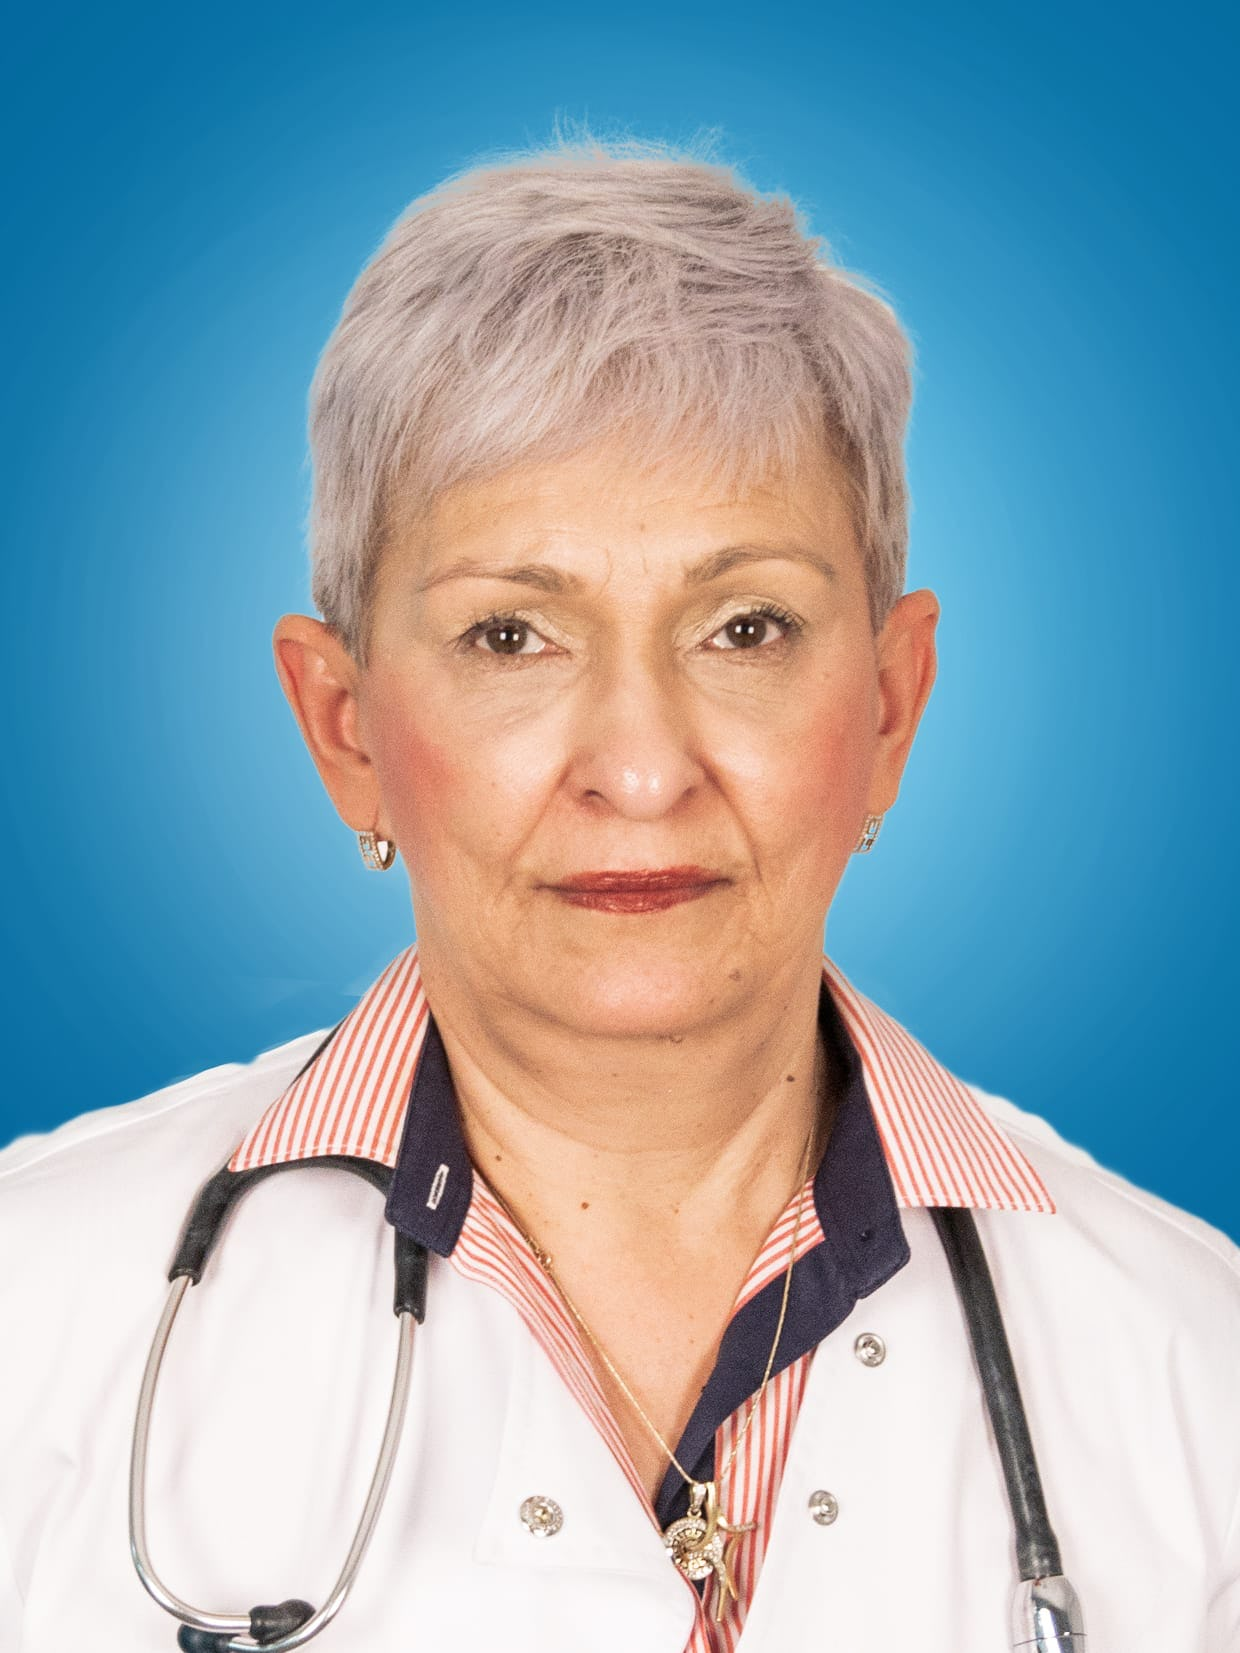 Doctor Mihaela Rugina